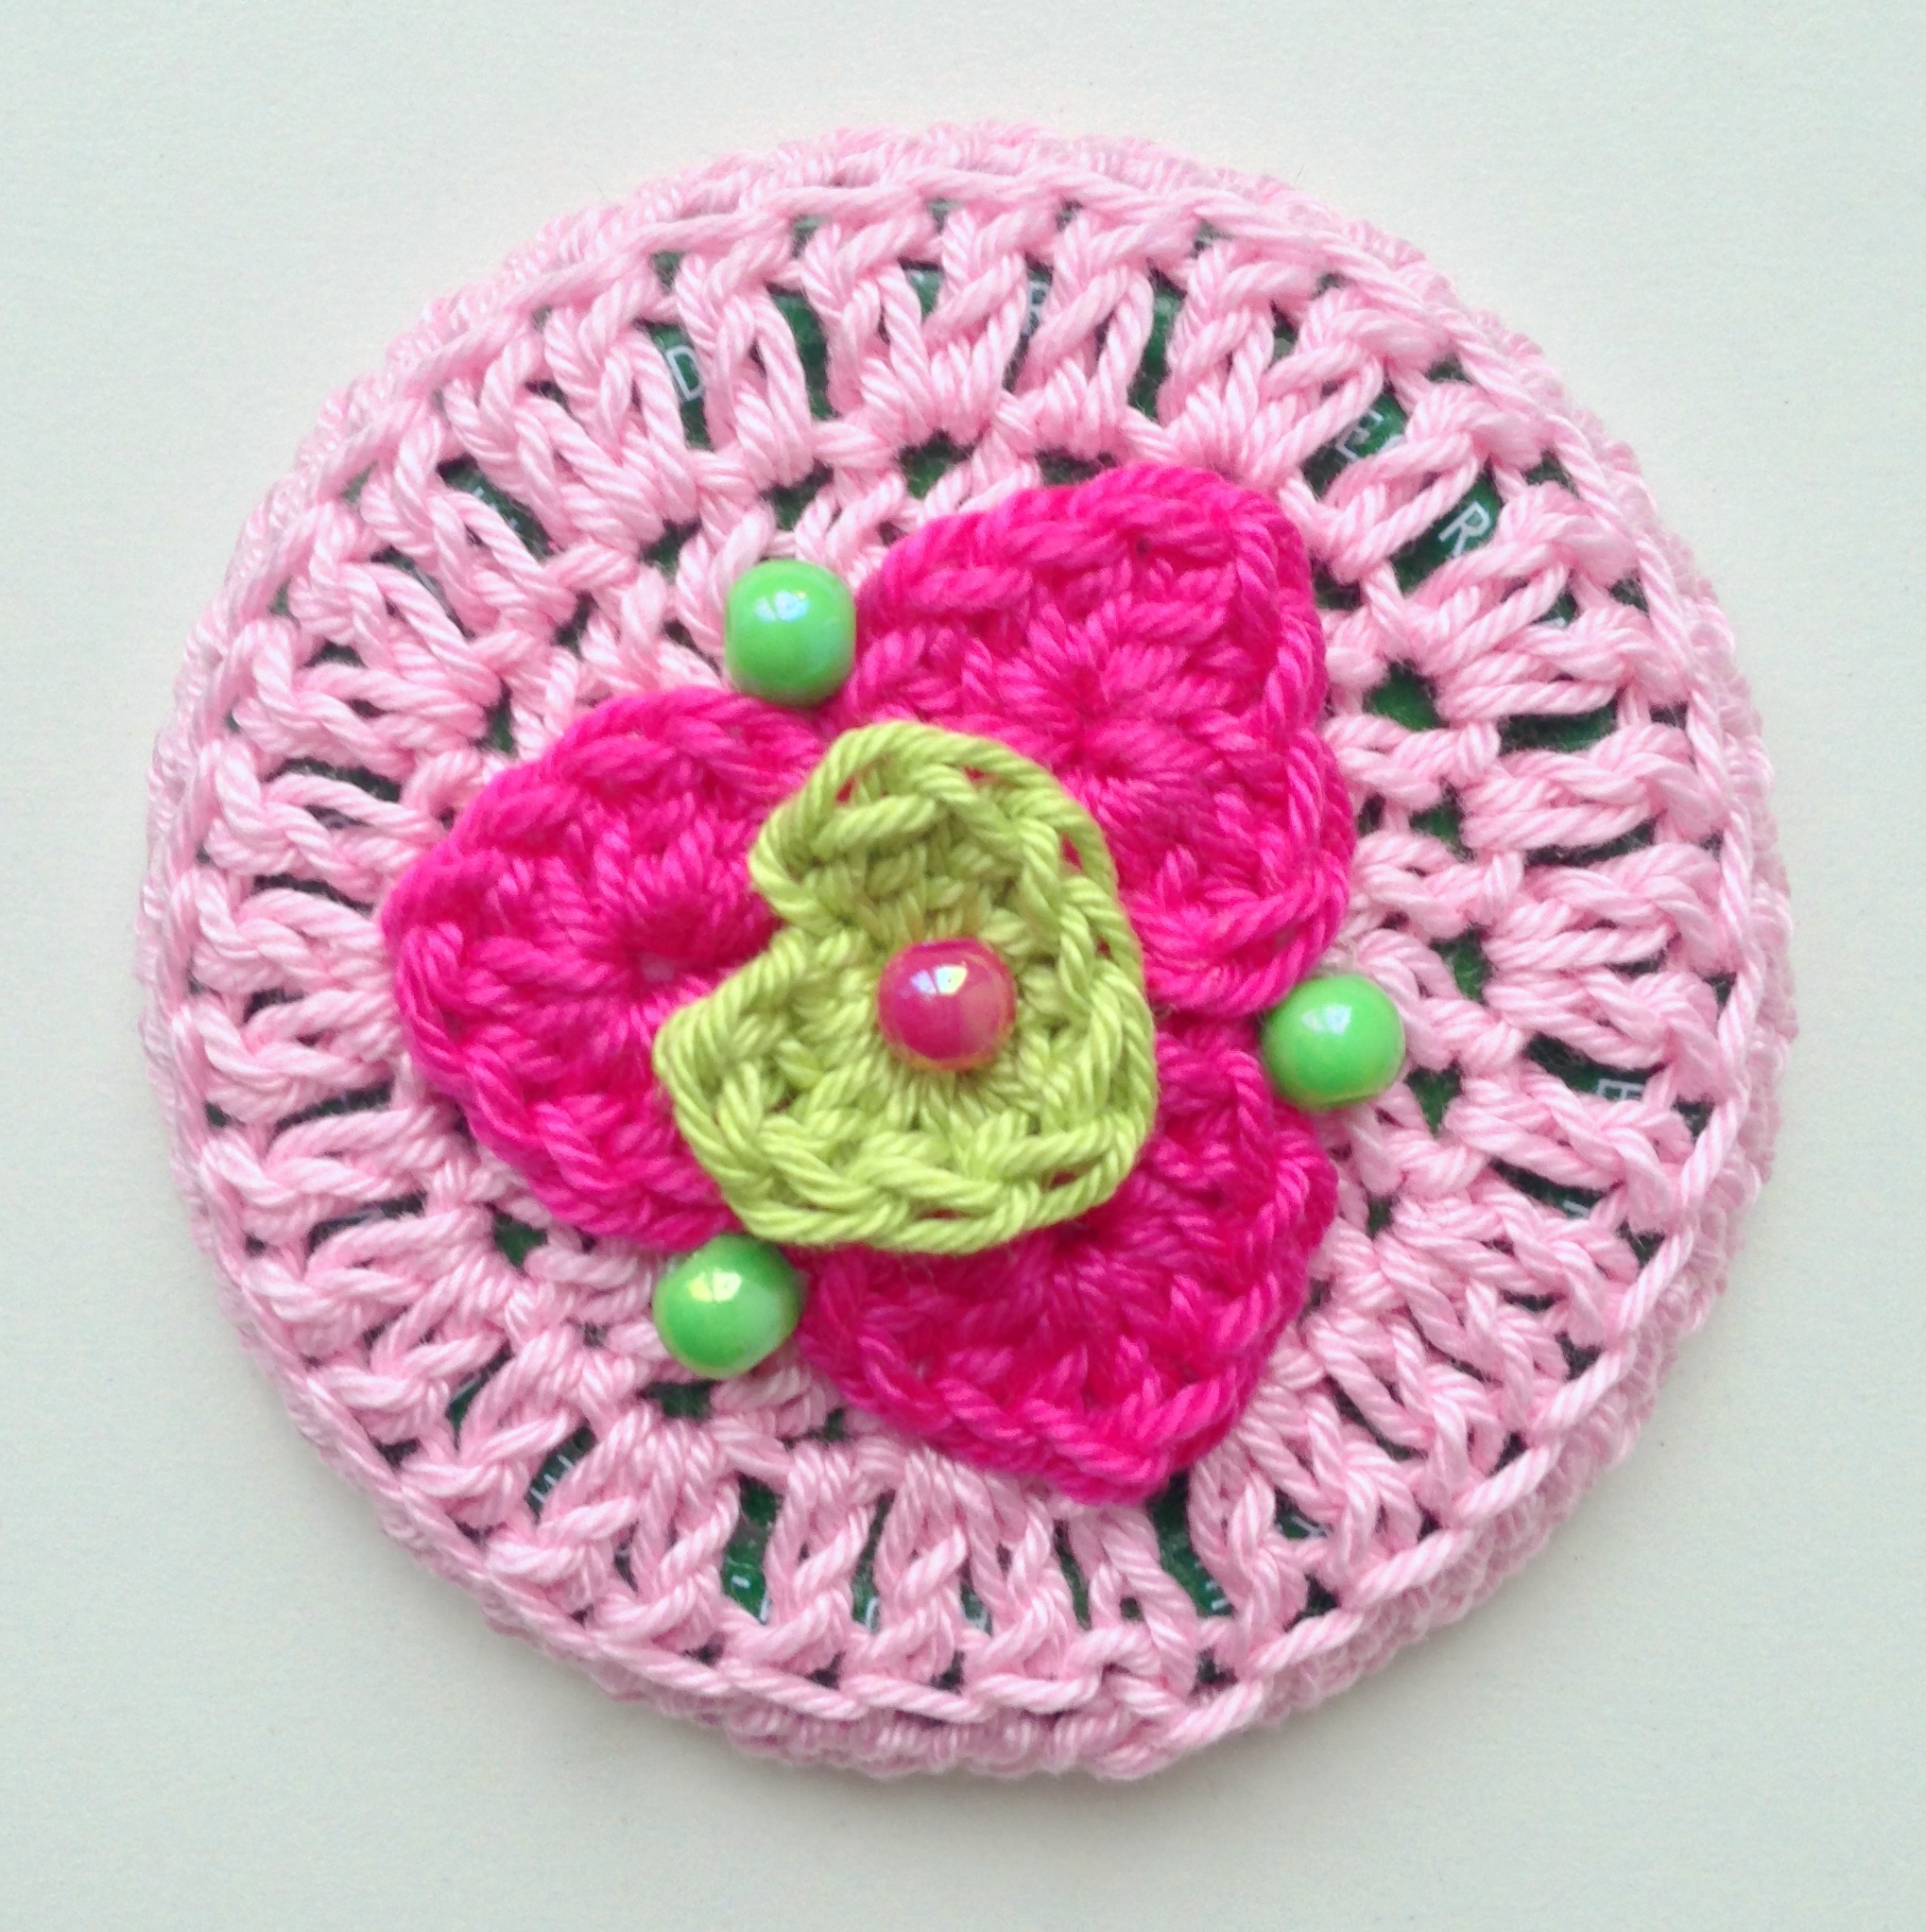 Crochet Jar Lid Covers maRRose CCC